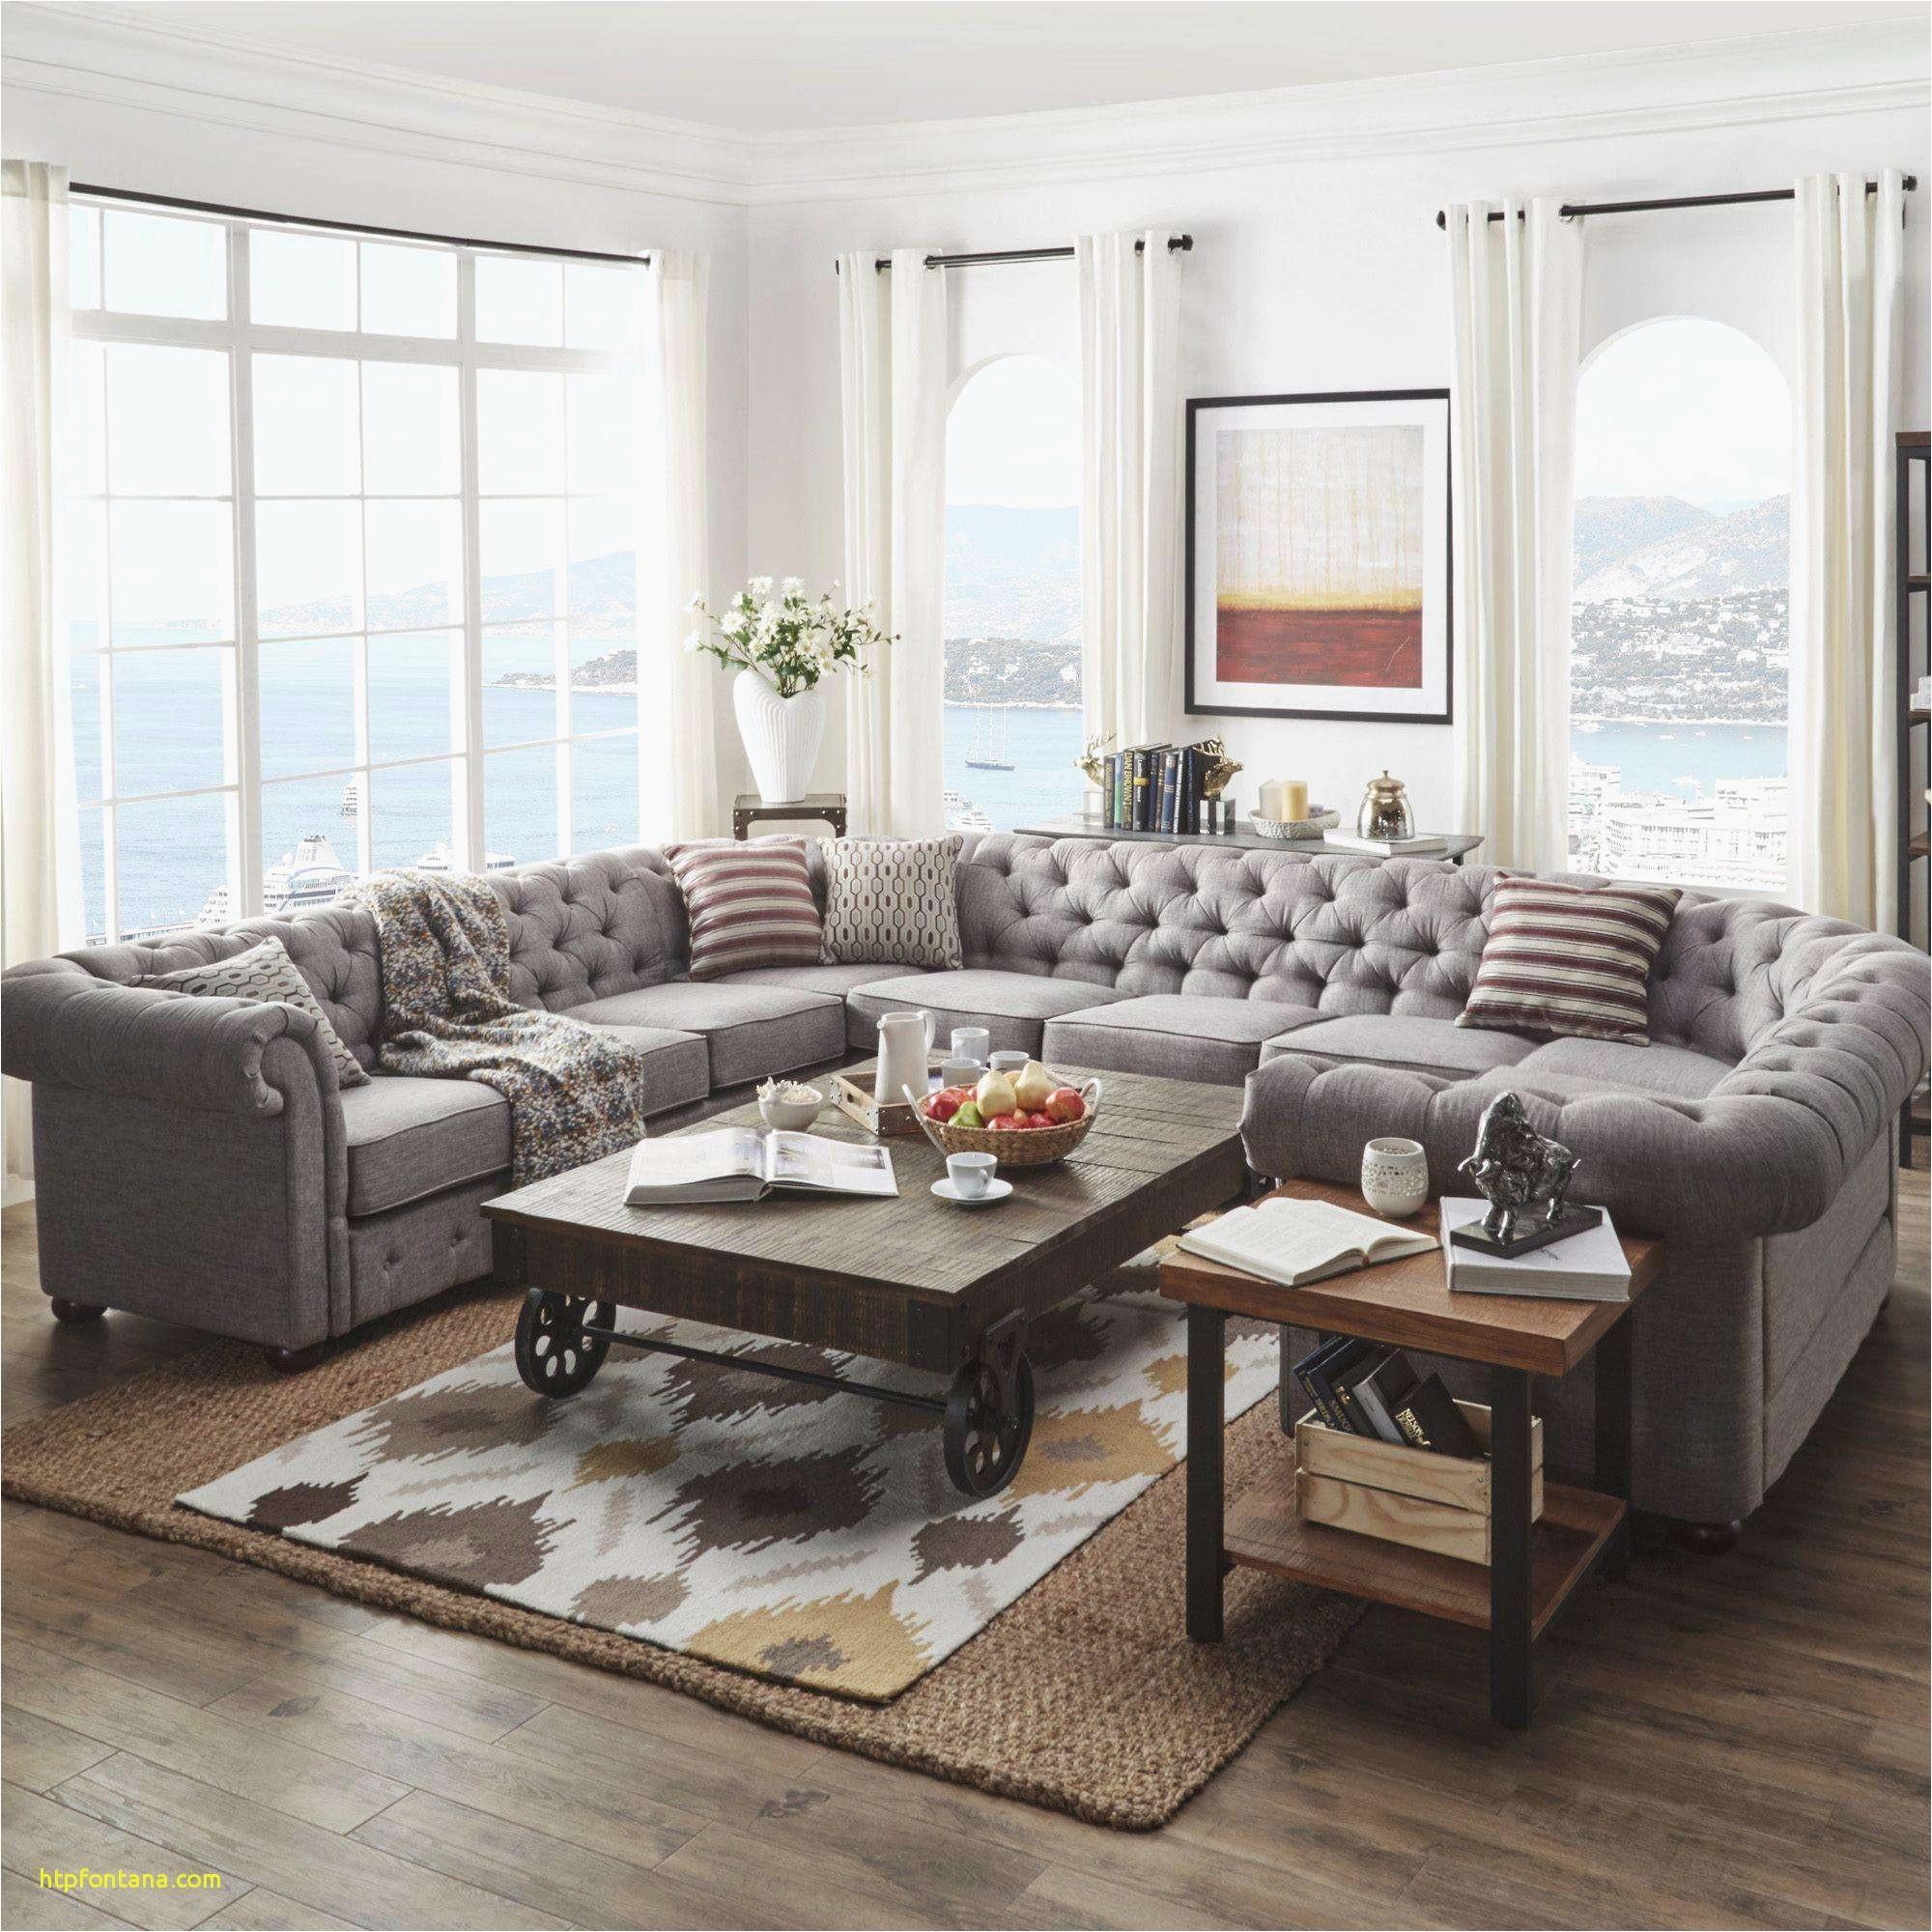 Sofa Side Table Elegant Living Room Coffee Table Sets Beautiful Living Room Idea Pics New